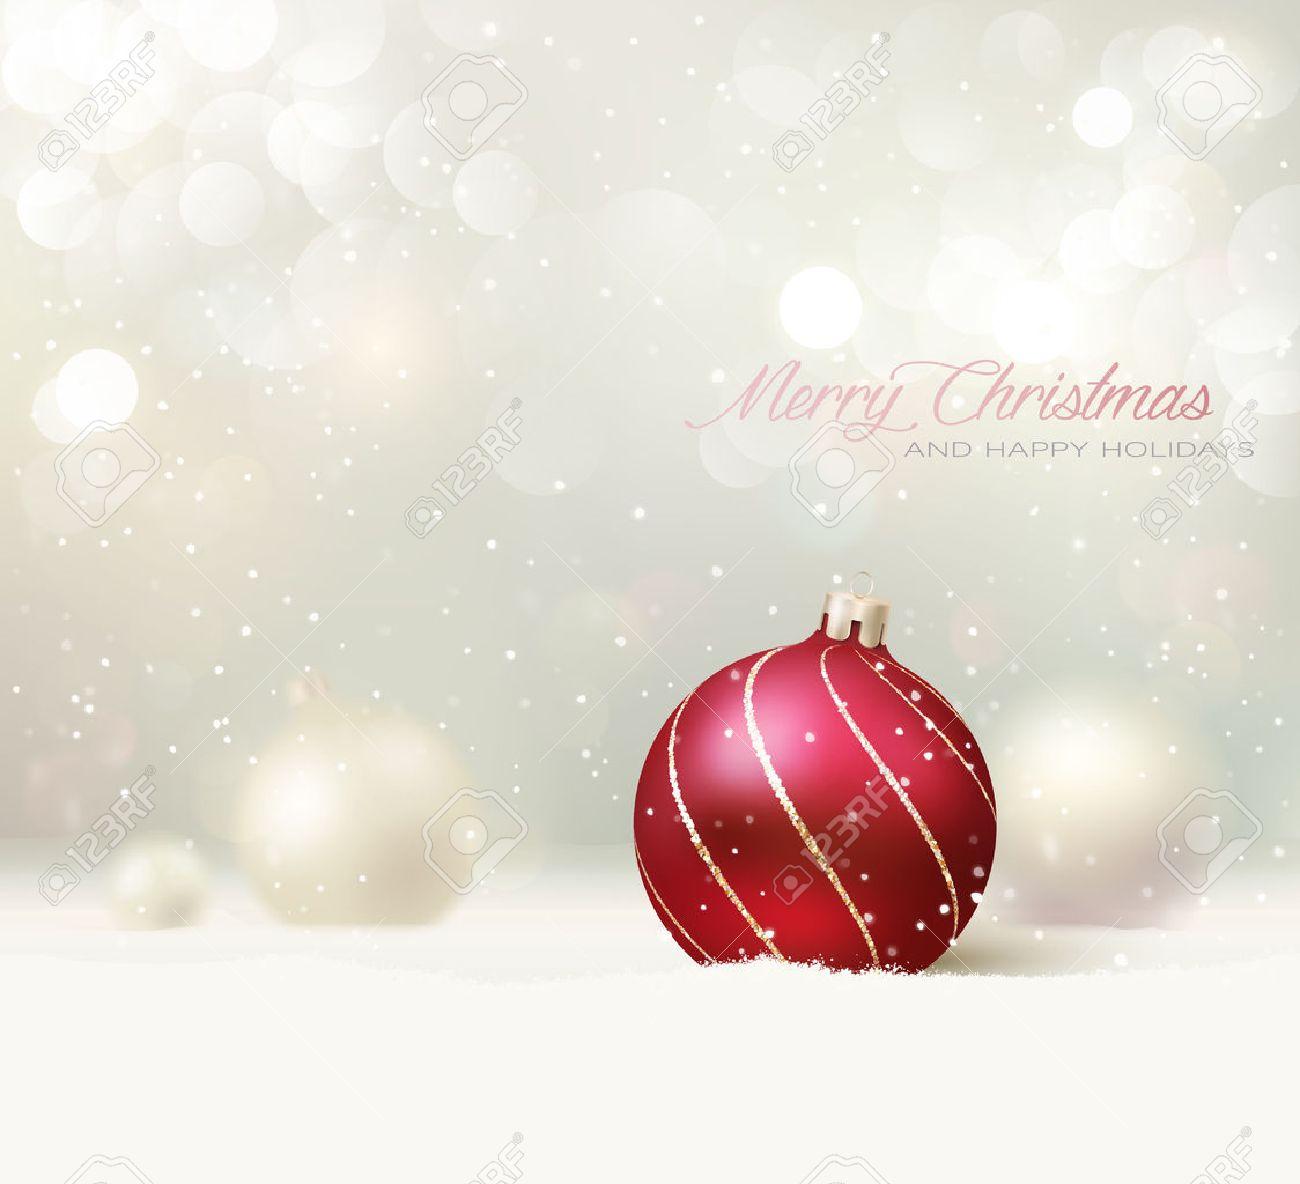 Elegant Christmas Card/Background - 33260164